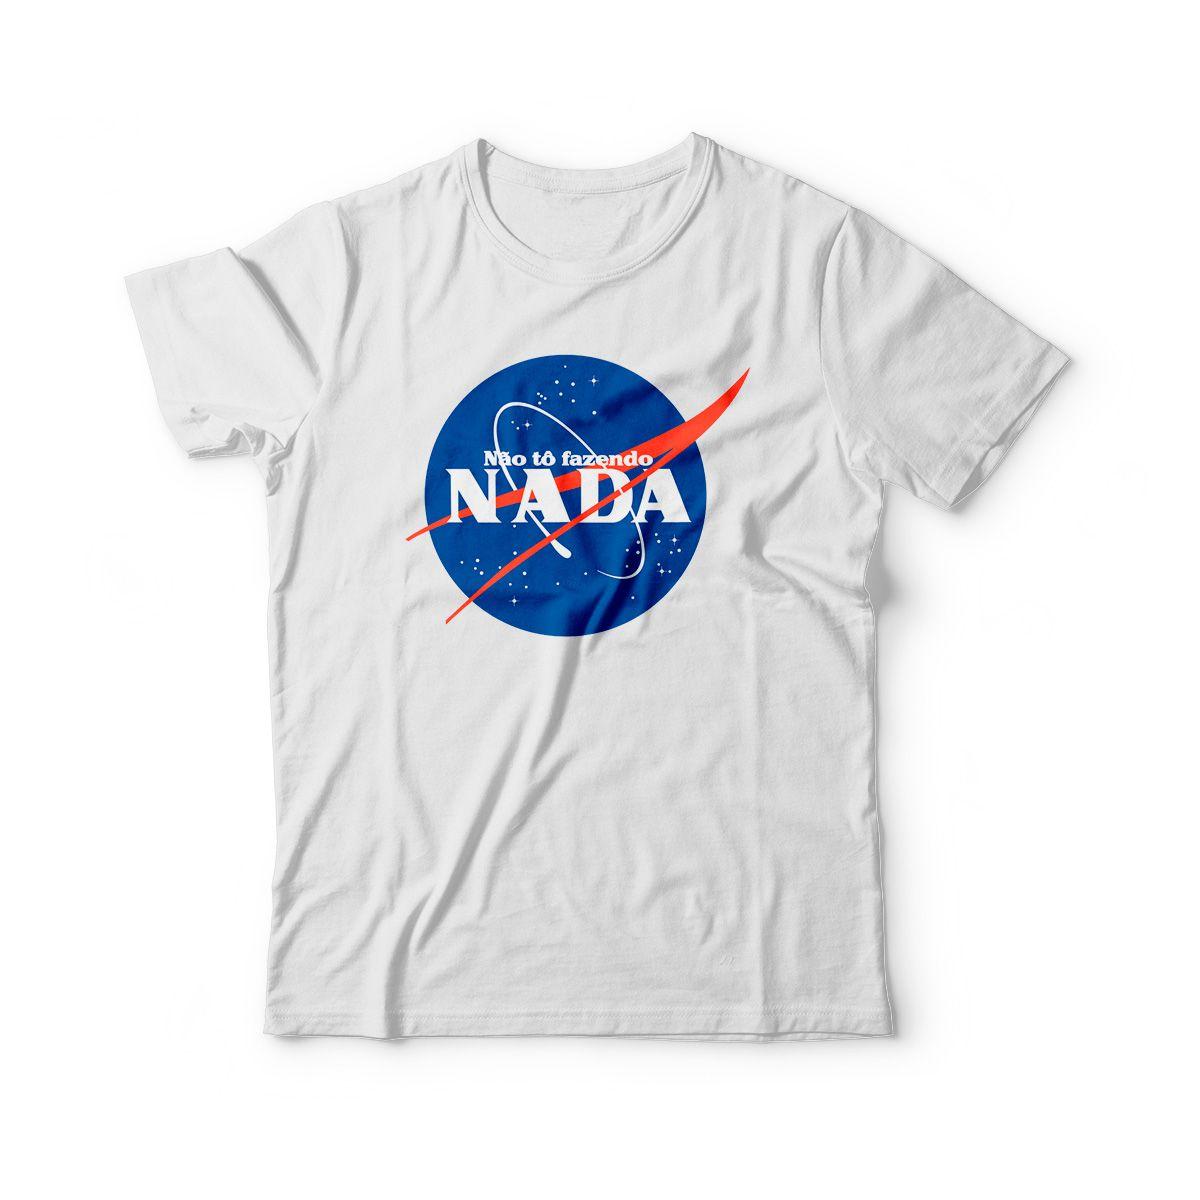 camiseta infantil engracada nao to fazendo nada